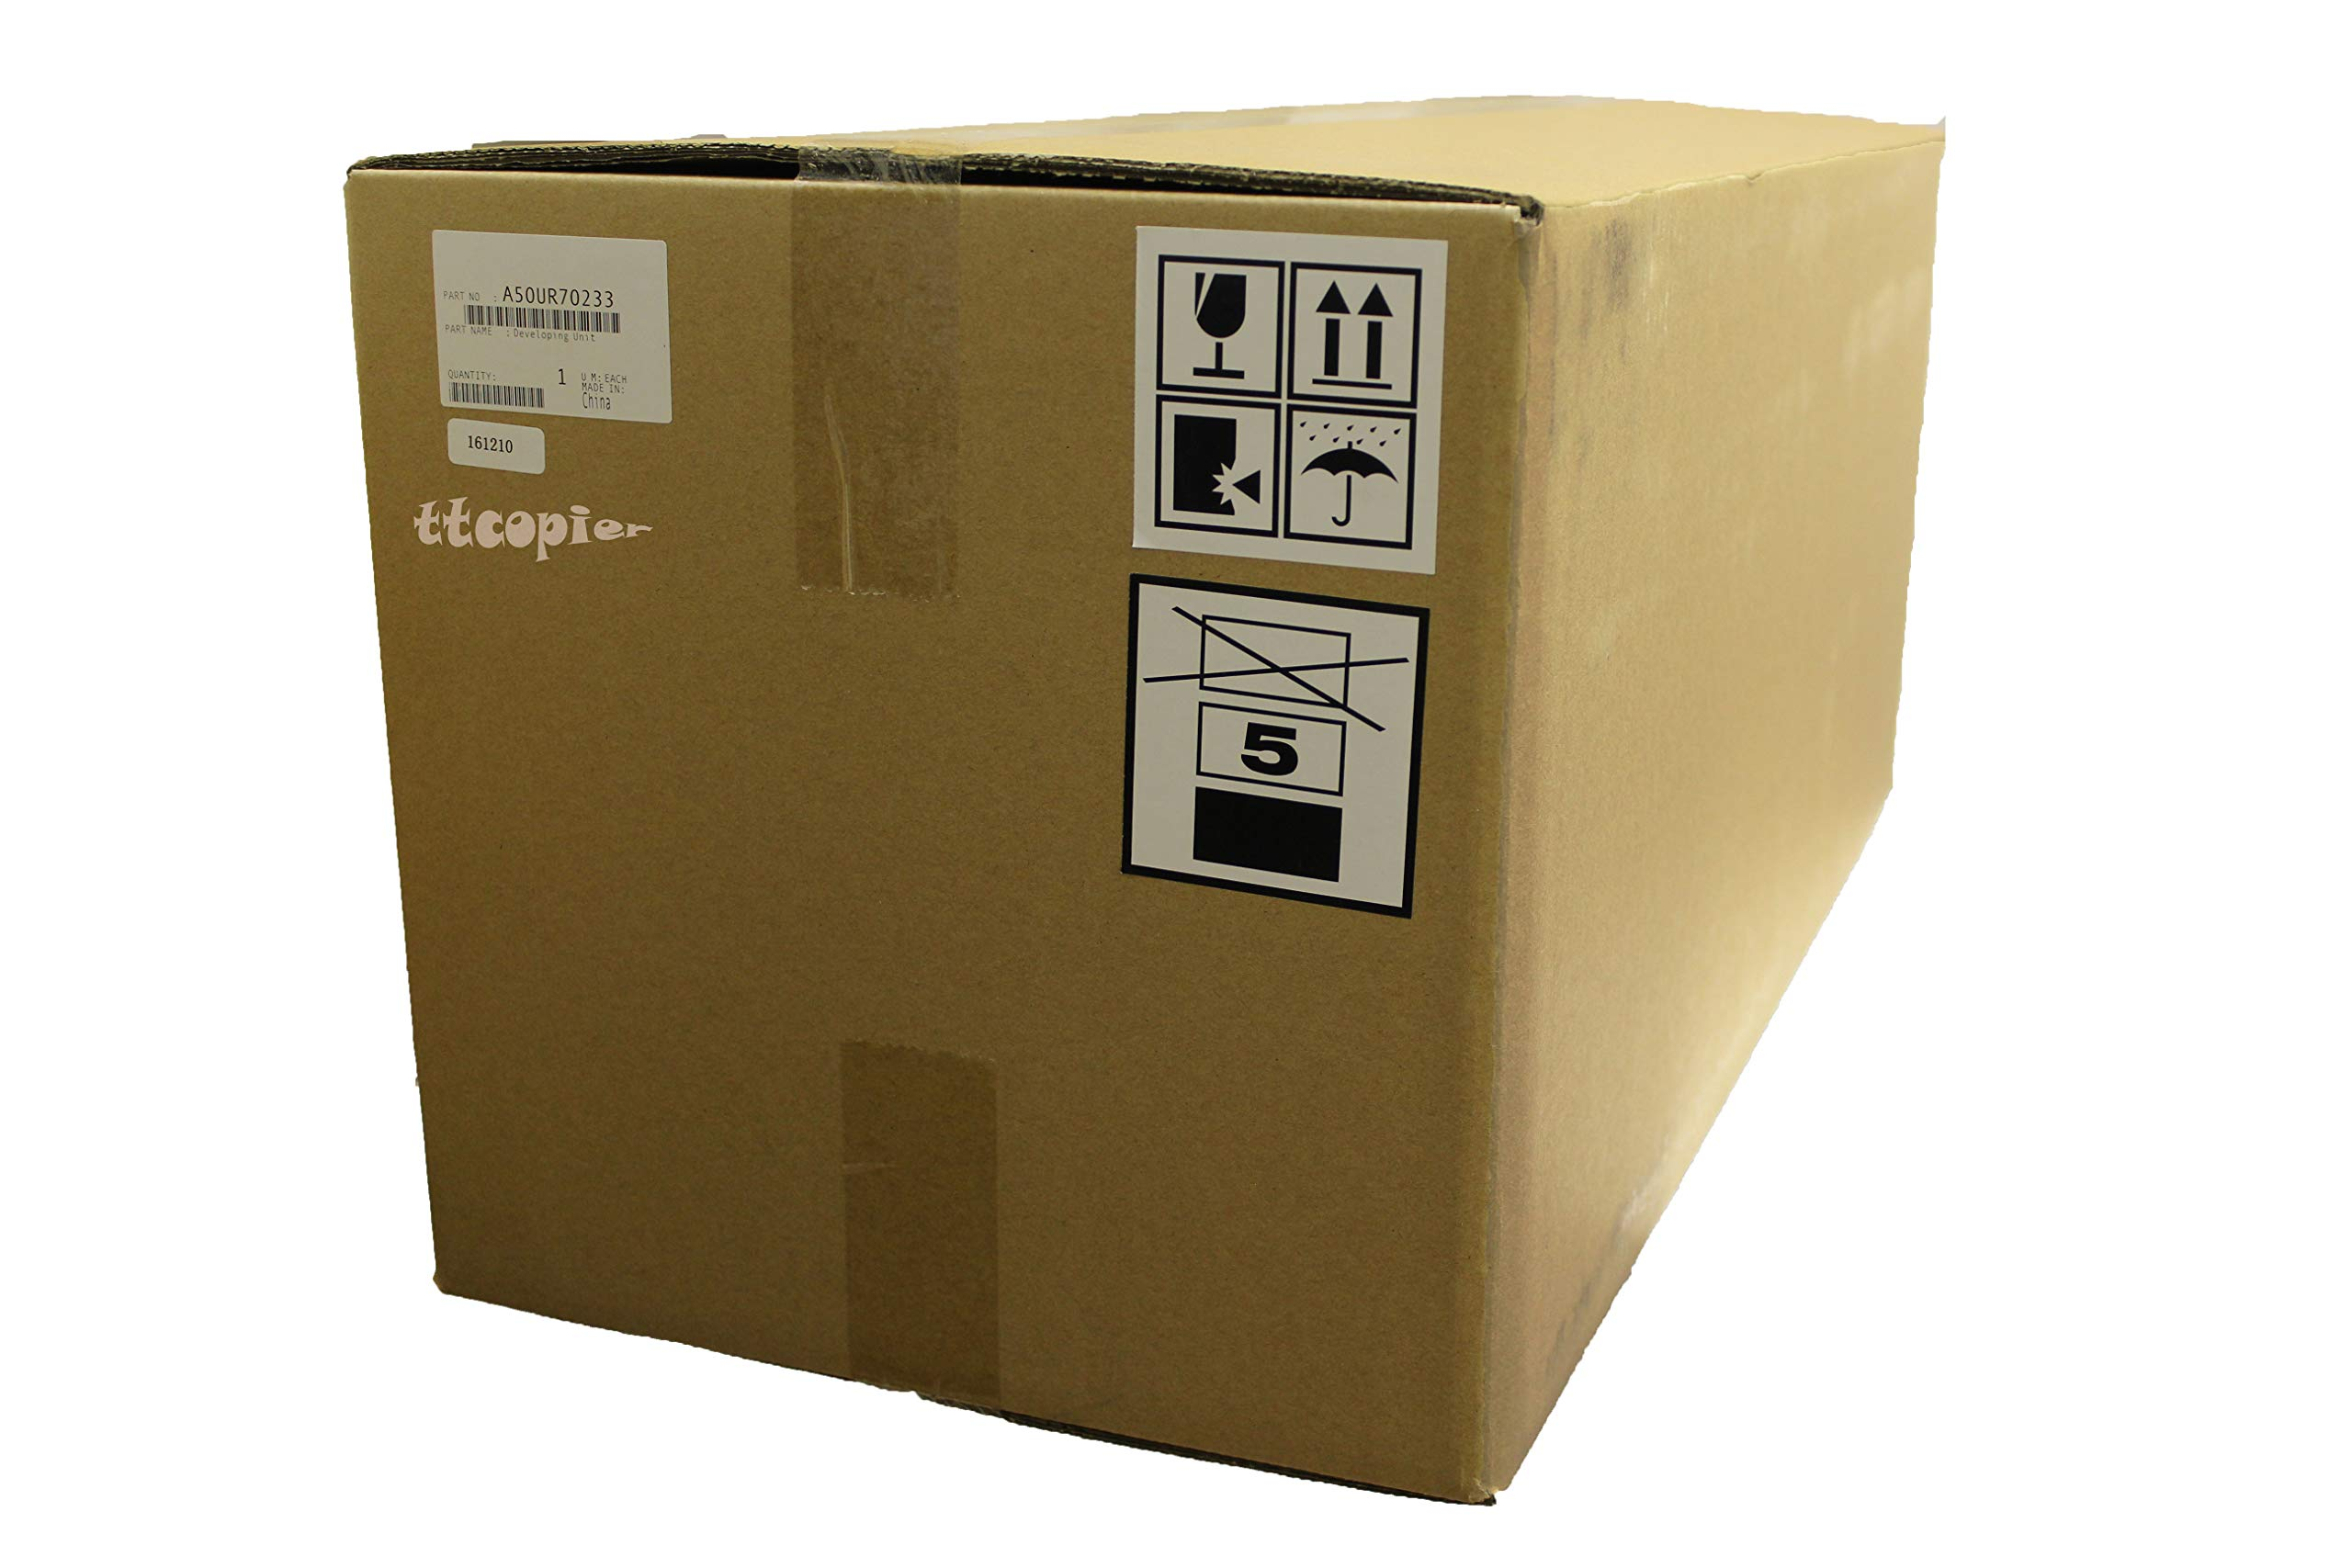 Genuine Konica Minolta A50UR70233 A50UR70222 A50UR70244 Developing Unit CMYK for C1070 C1060 C2060